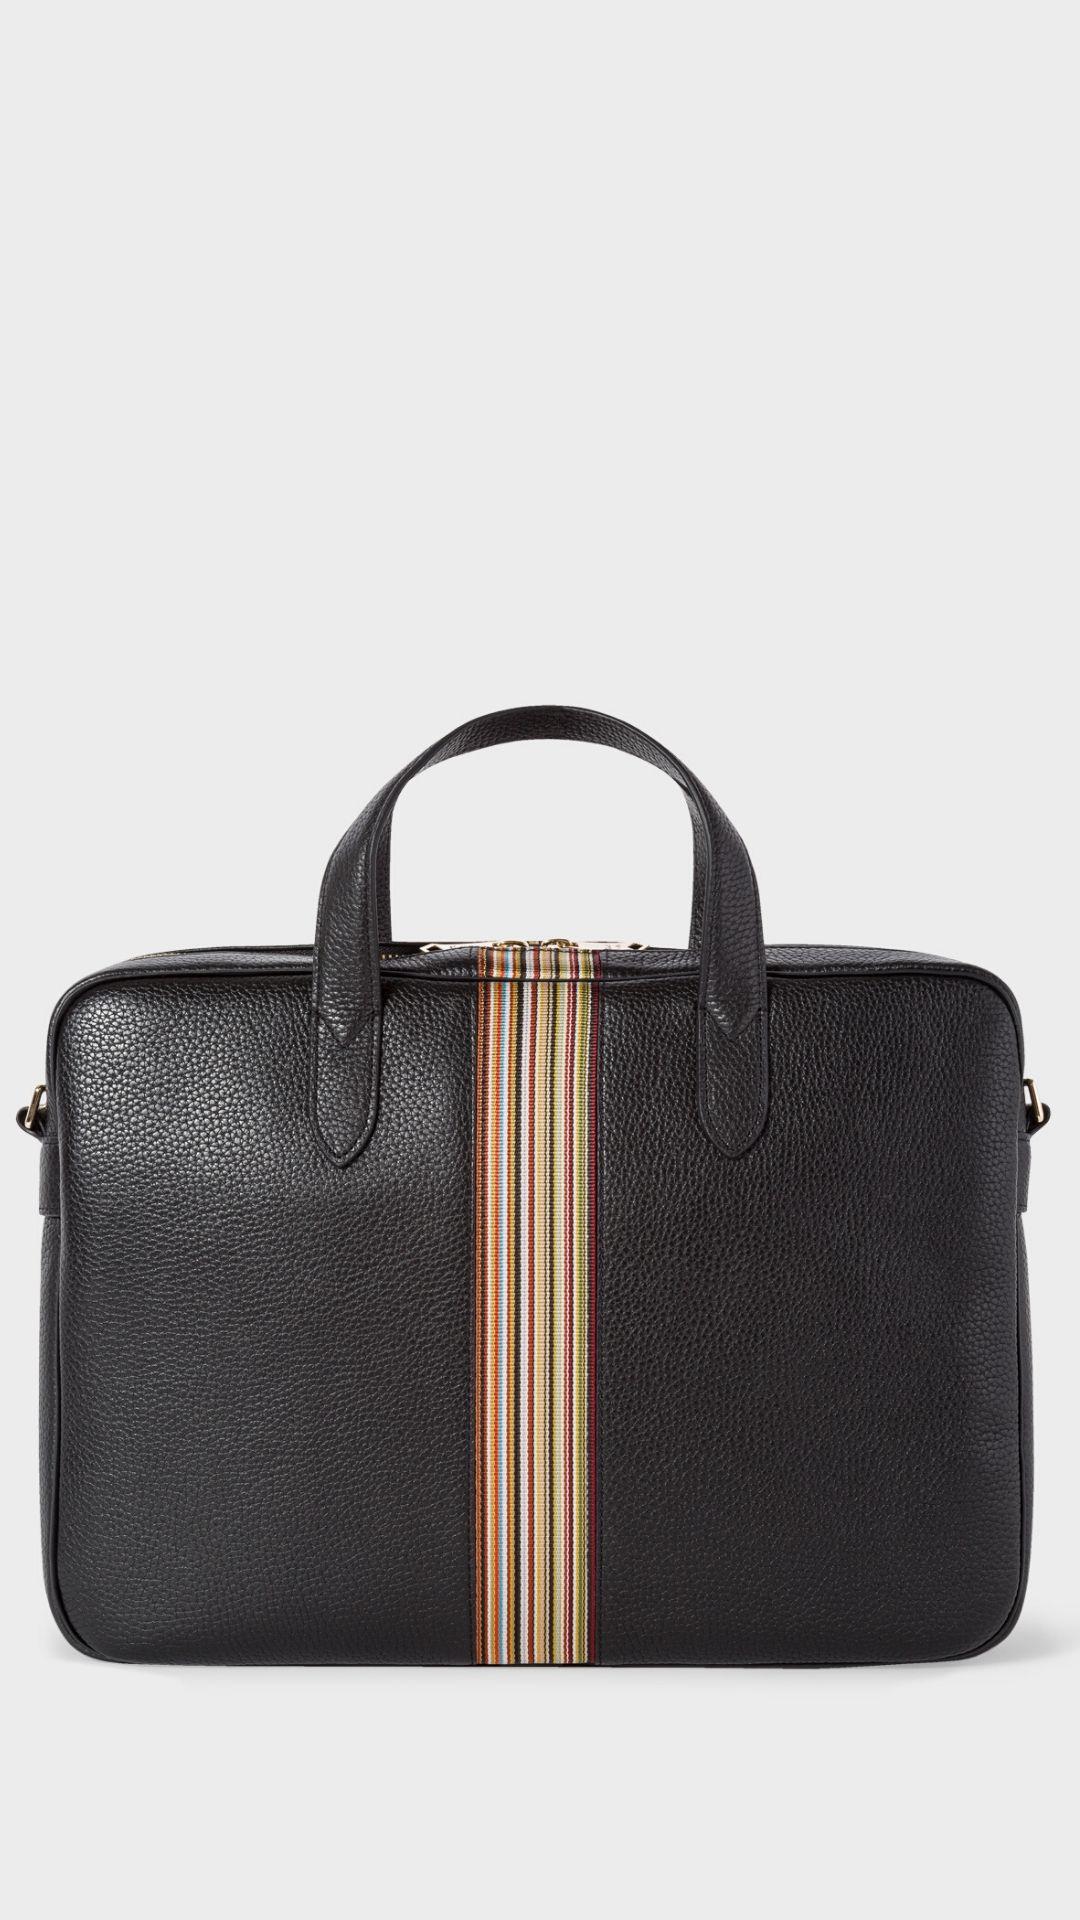 briefcase, work wear, menswear, fashion, 2020, esquire, thom browne, dunhill, bottega, dolce&gabbana,